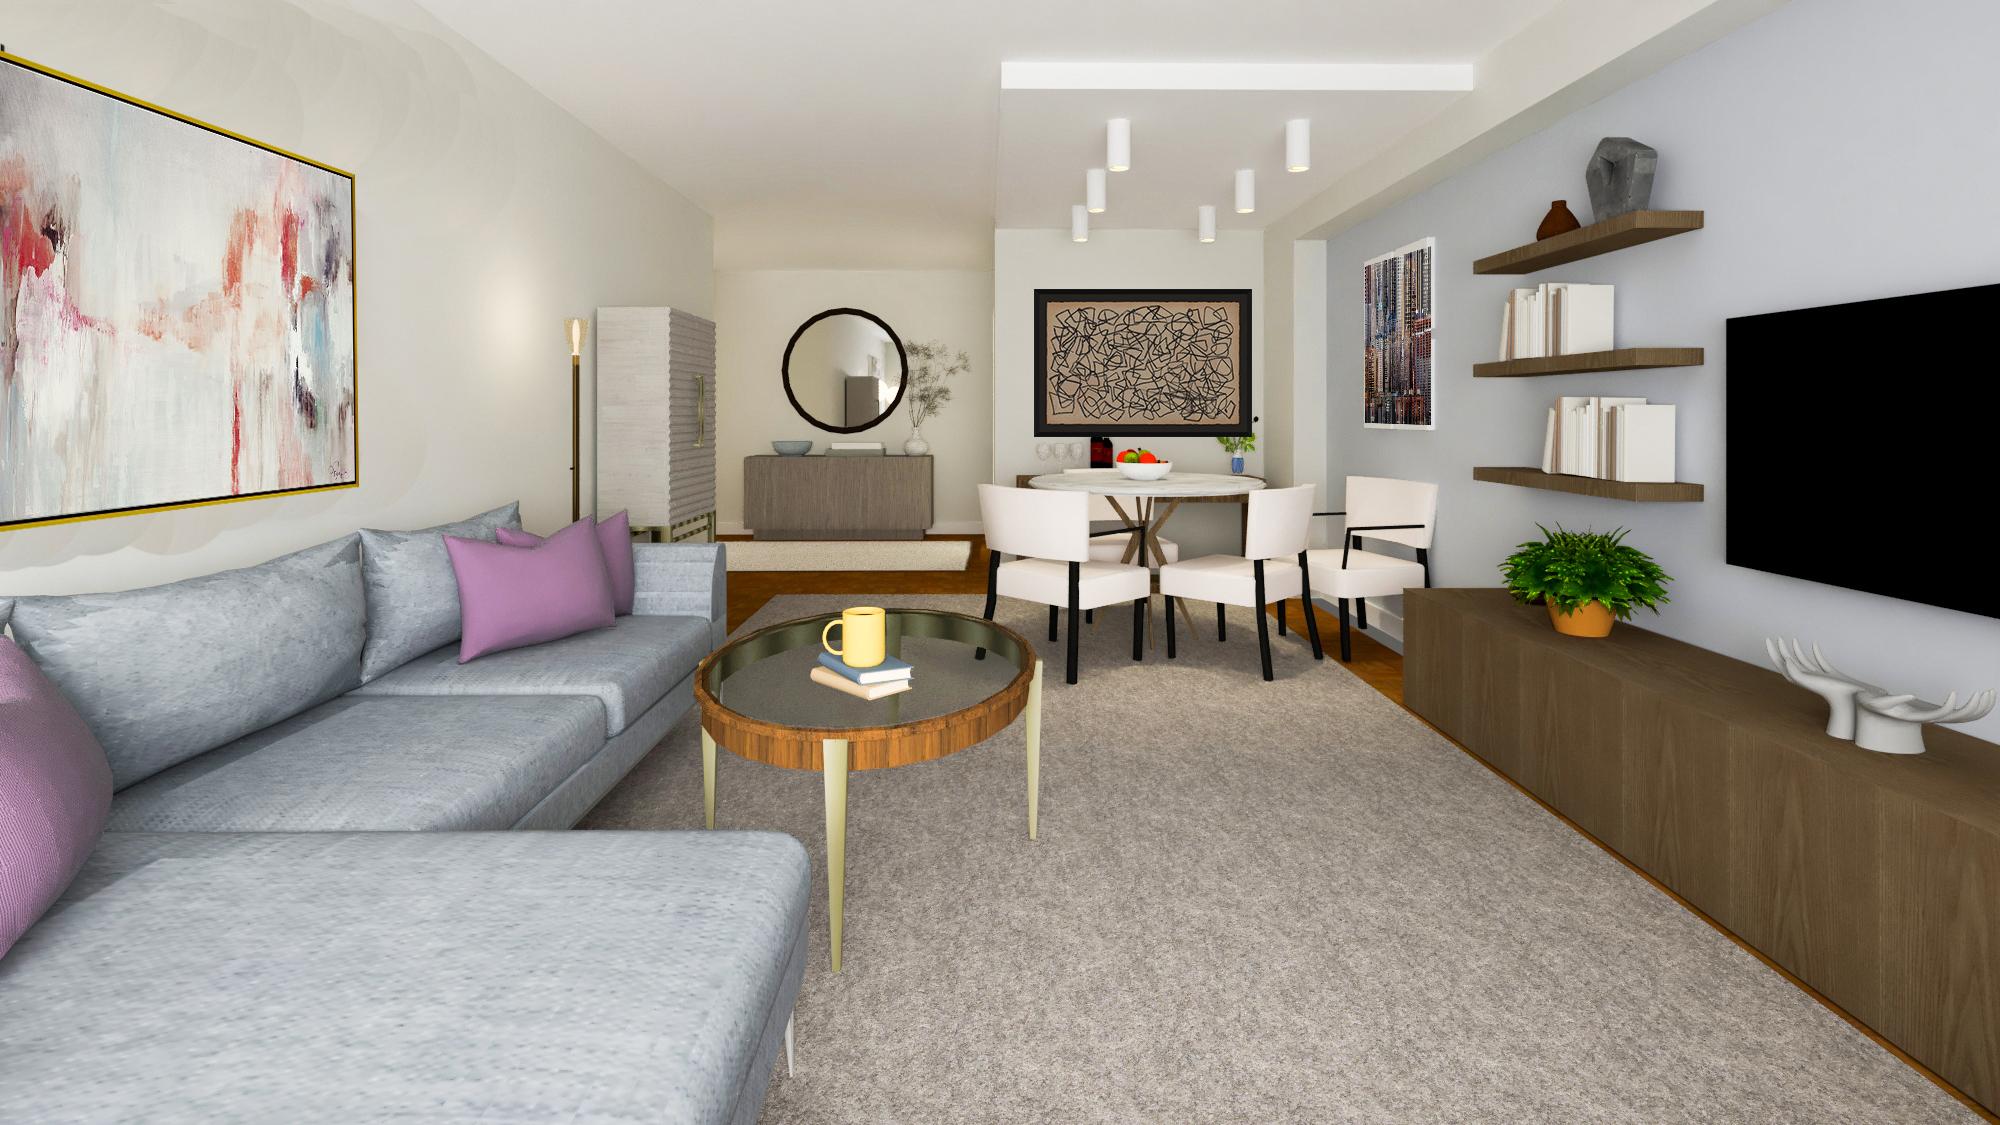 Greenbaum Livingroom with ART1.jpg